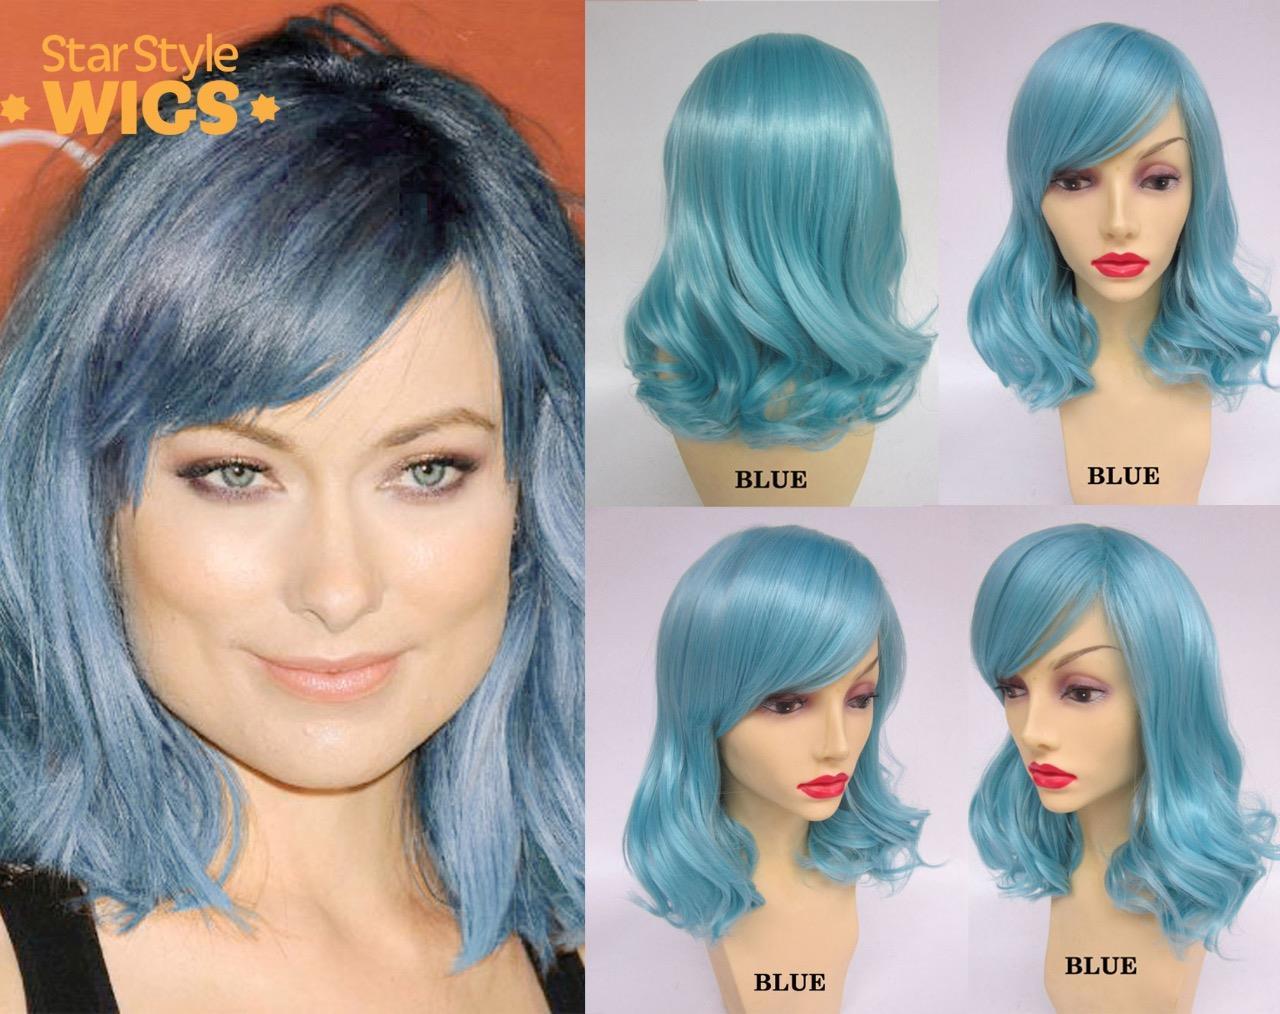 Deluxe-longitud-media-Pastel-Ondulado-Pelucas-Resistente-al-Calor-Moda-Rosa-Azul-Plata